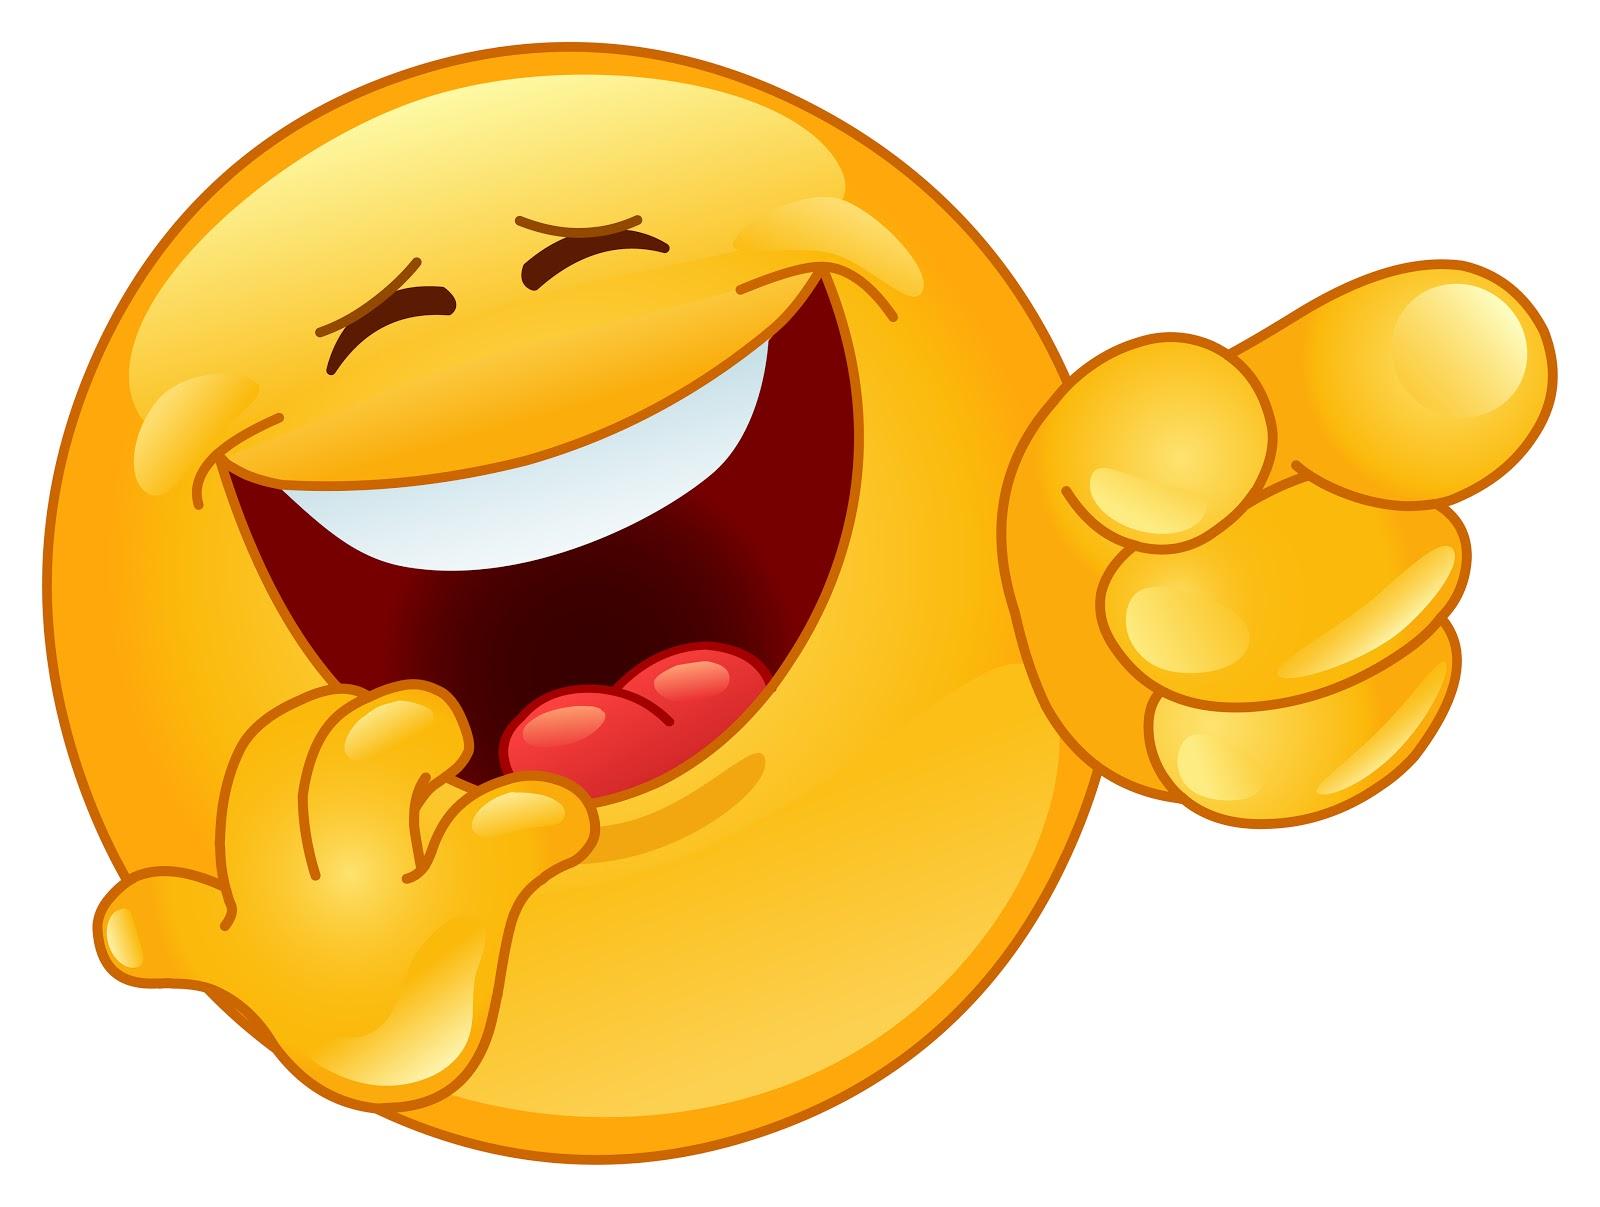 Free Laugh Cliparts, Download Free Clip Art, Free Clip Art.